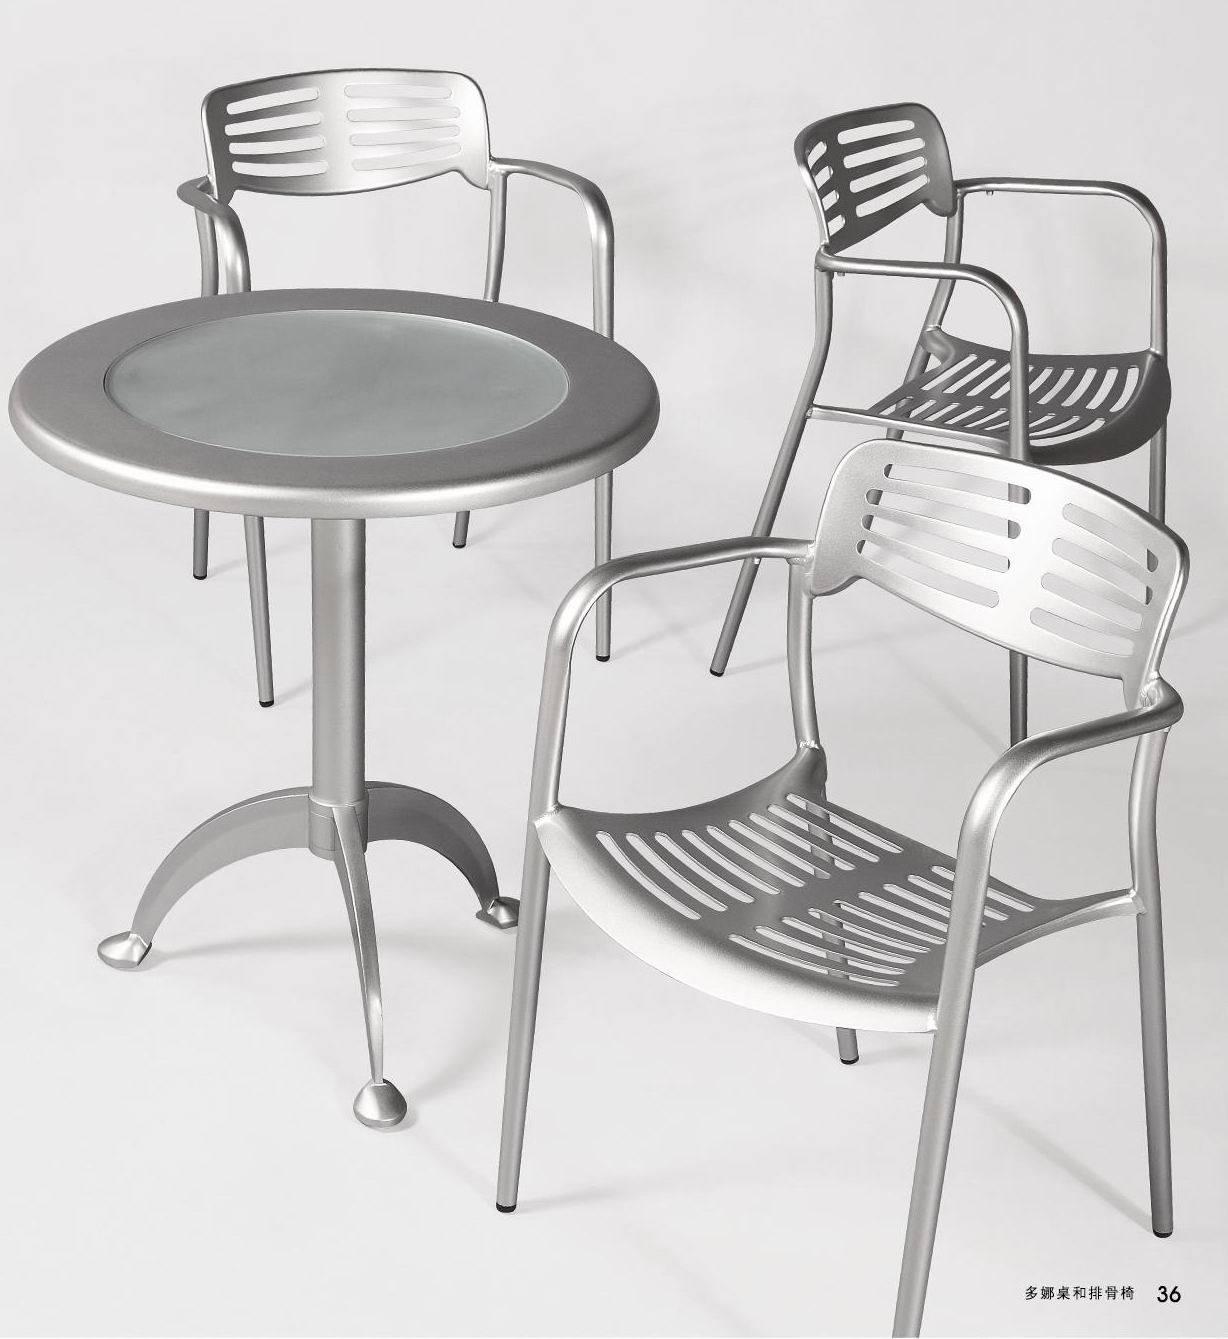 Aluminio muebles de terraza aluminio muebles de terraza for Muebles jardin aluminio